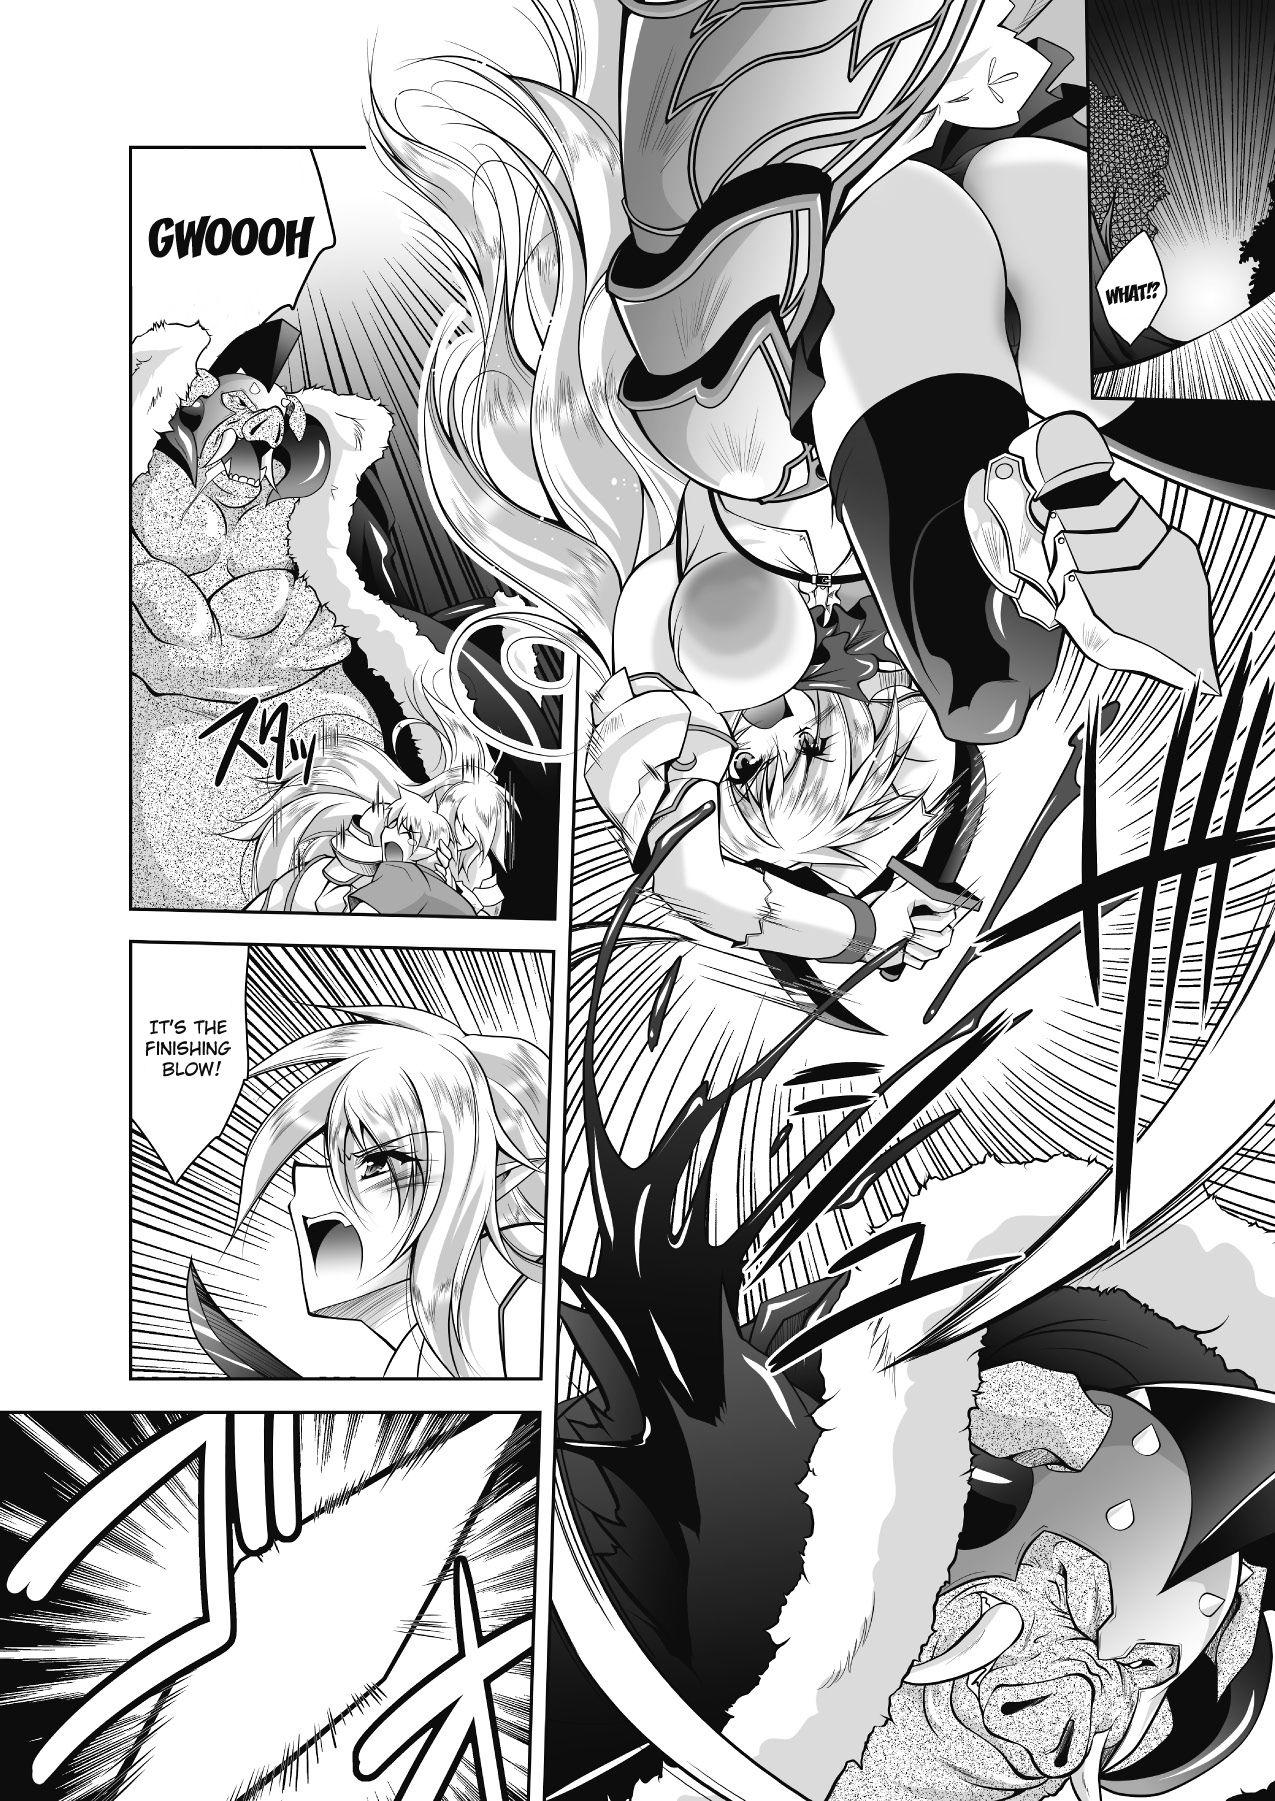 Juuyoku ni Kegareta Erufu Hime Kishi Sefiria | An Elf Sullied by Bestial Lust Princess Knight Sefiria 3